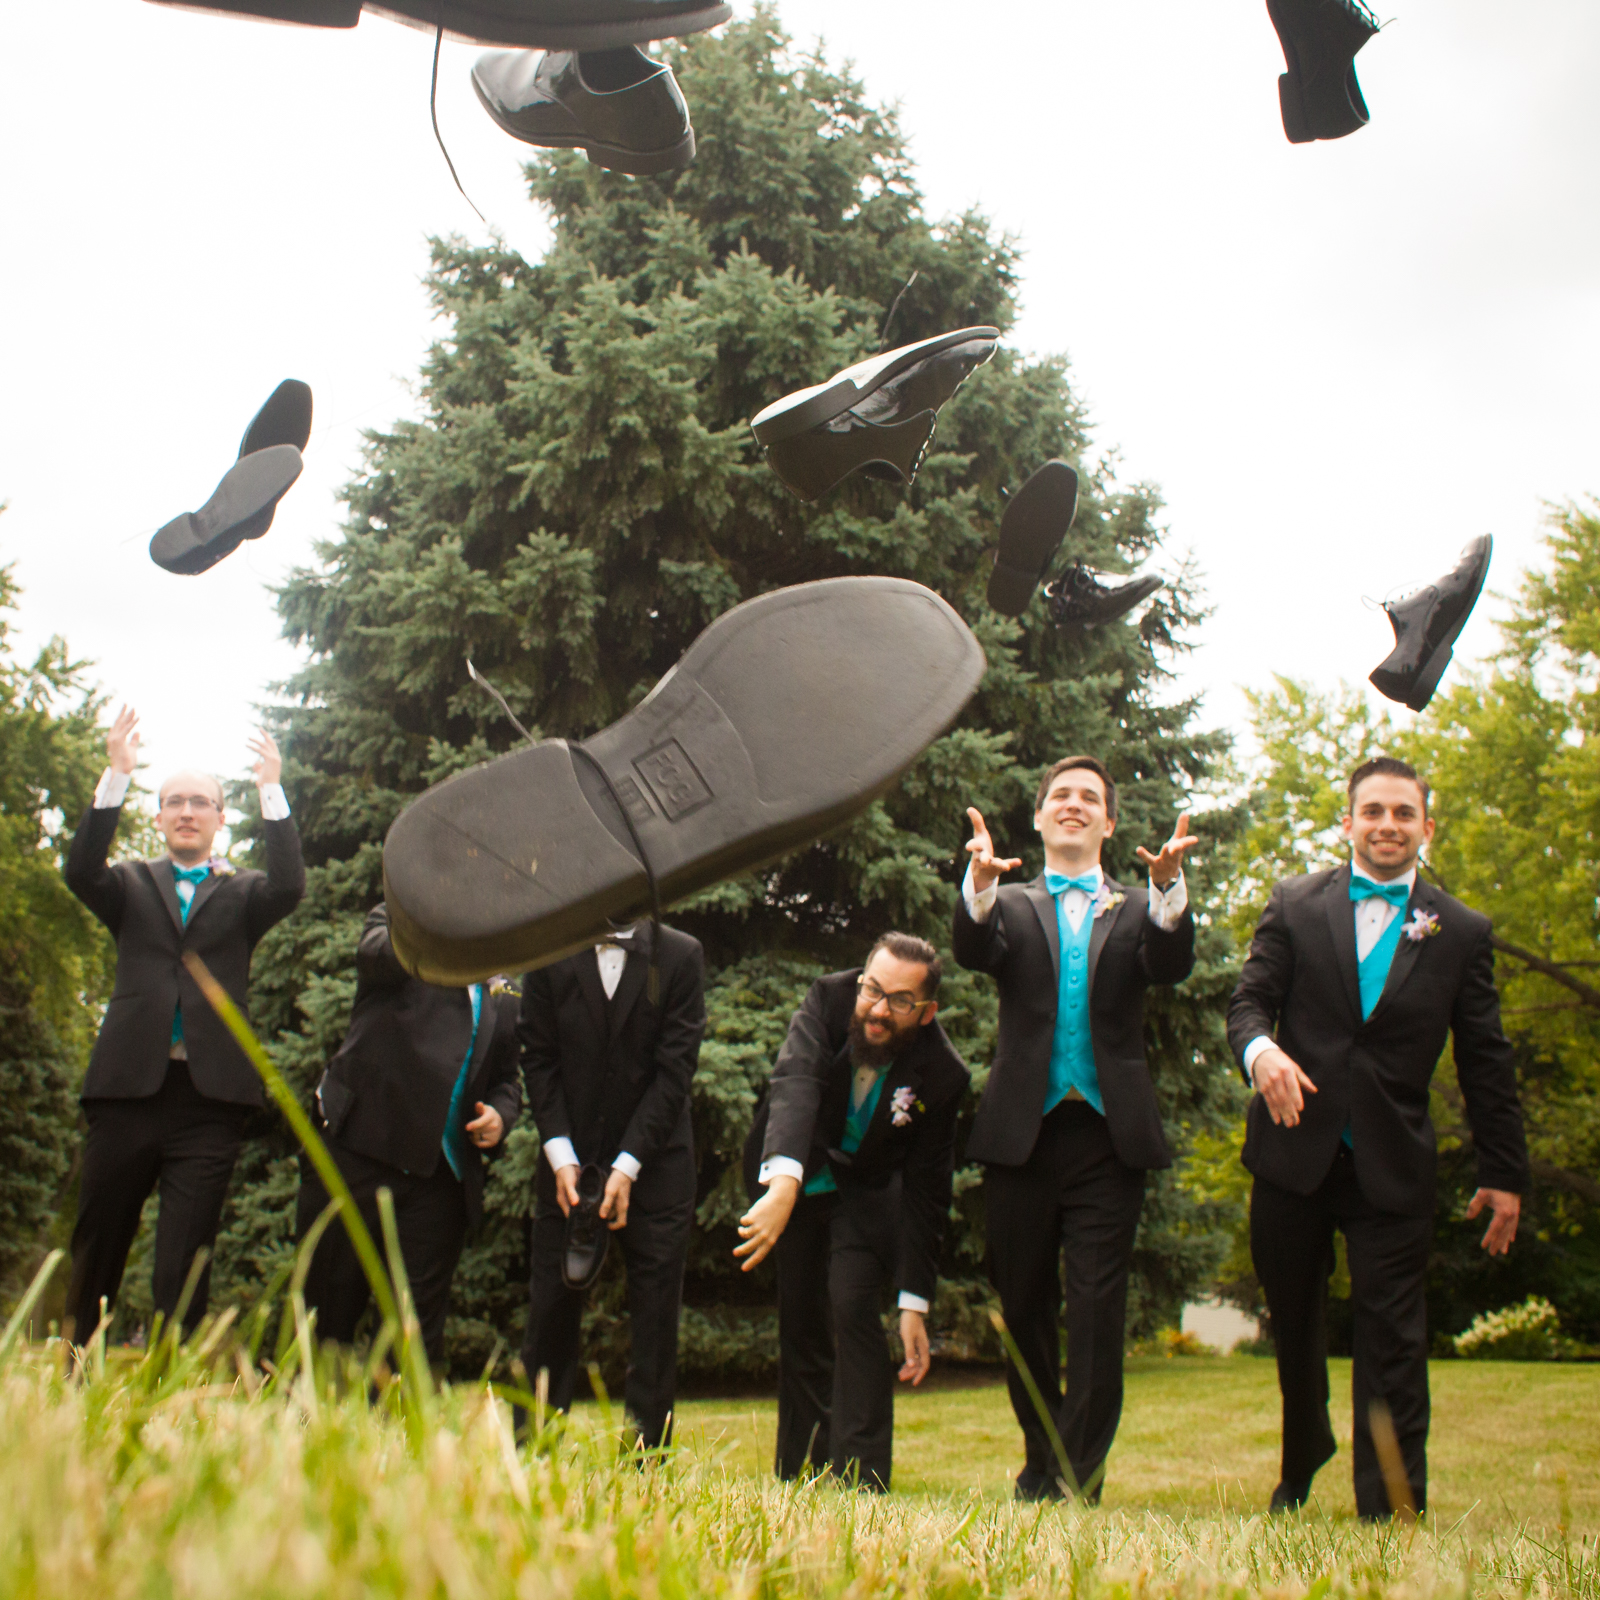 naperville-wedding-photography-50.jpg